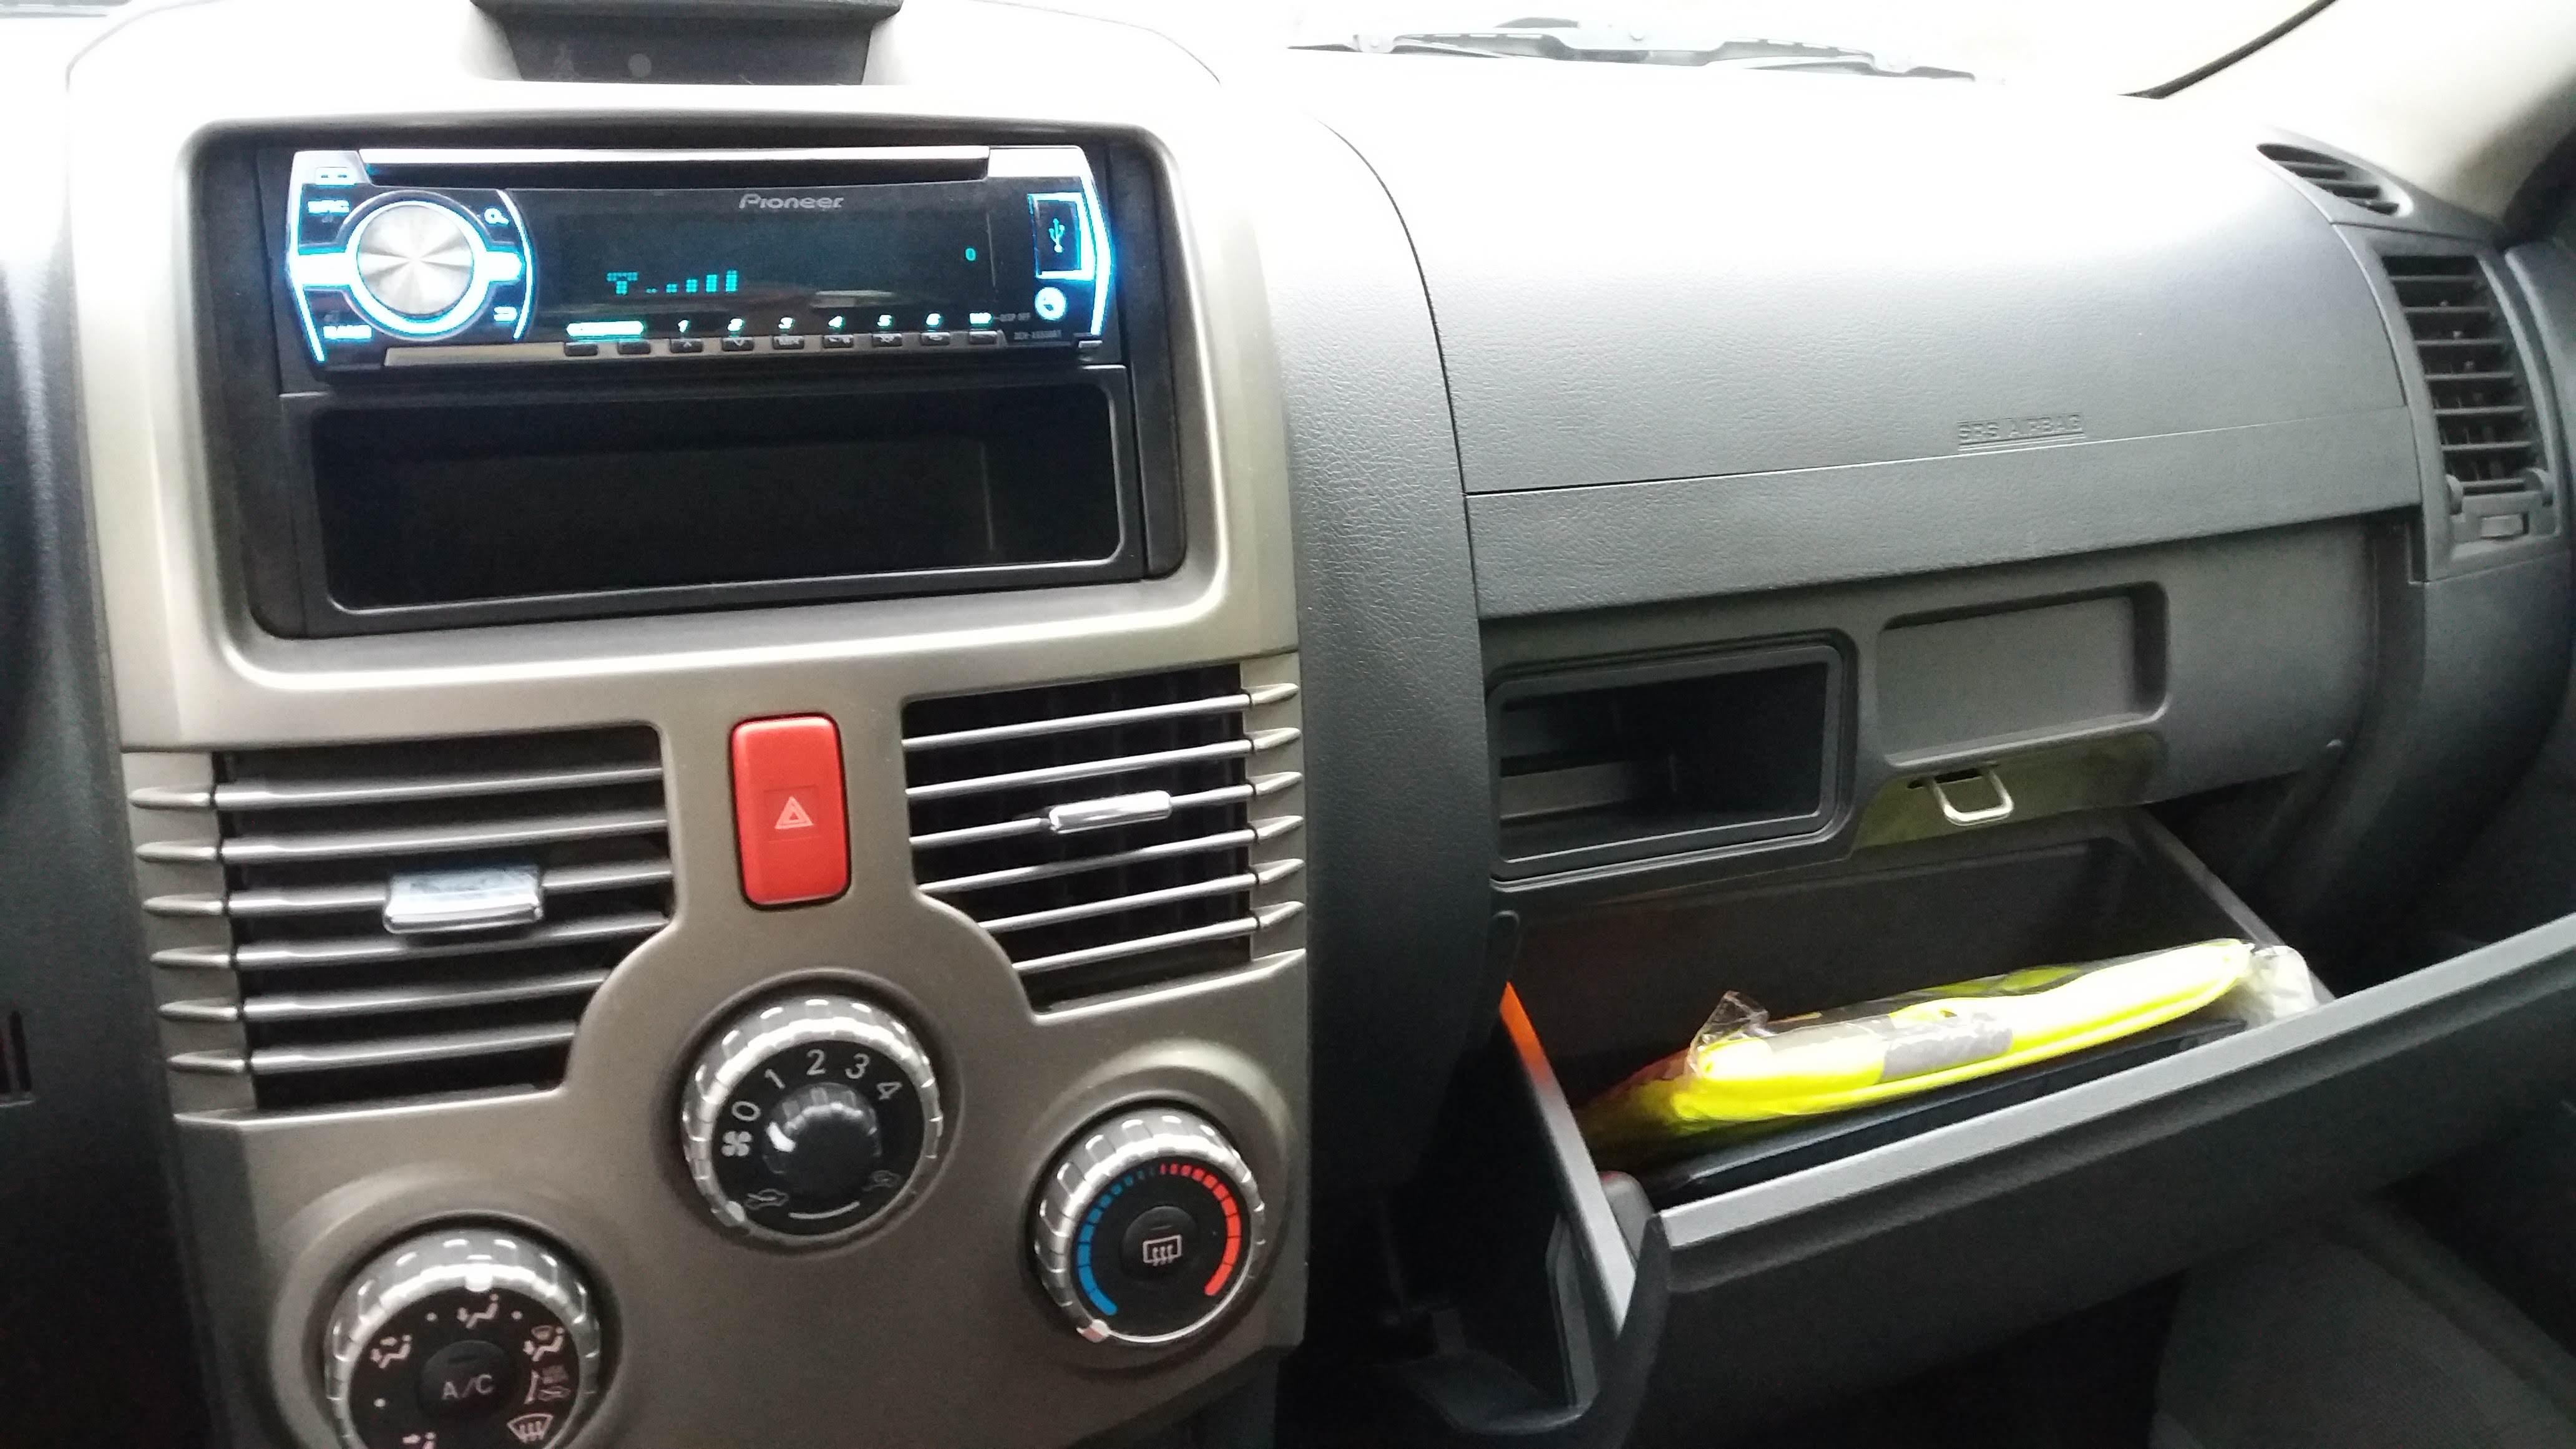 Daihatsu Terios GLI 4x2 MEC año 2013